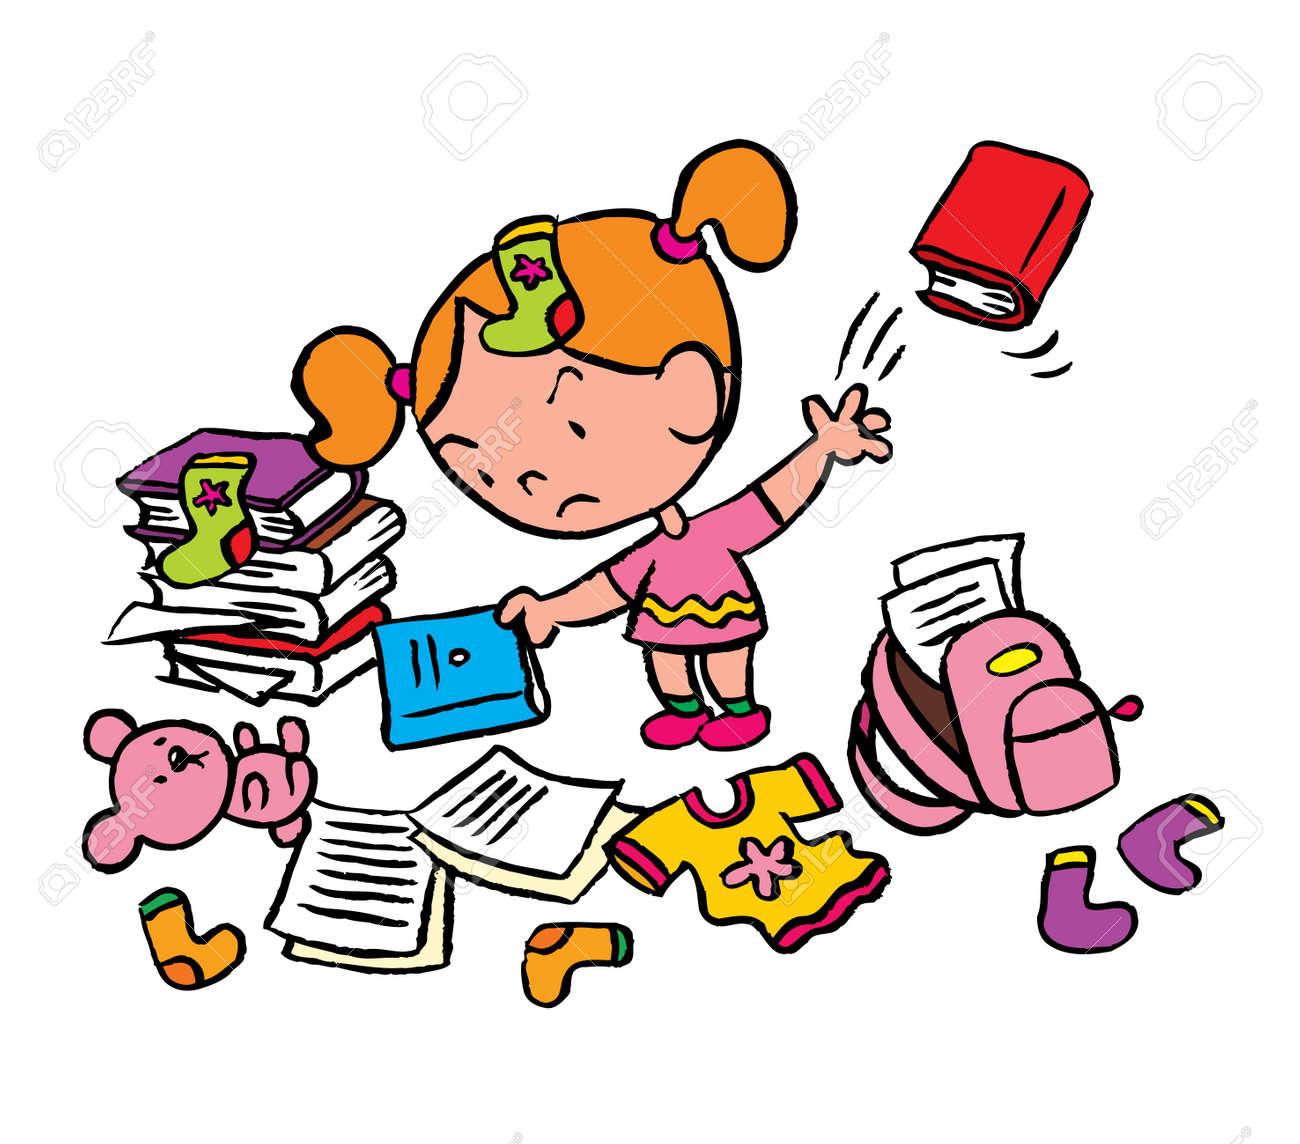 Little Schoolgirl In A Messy Room